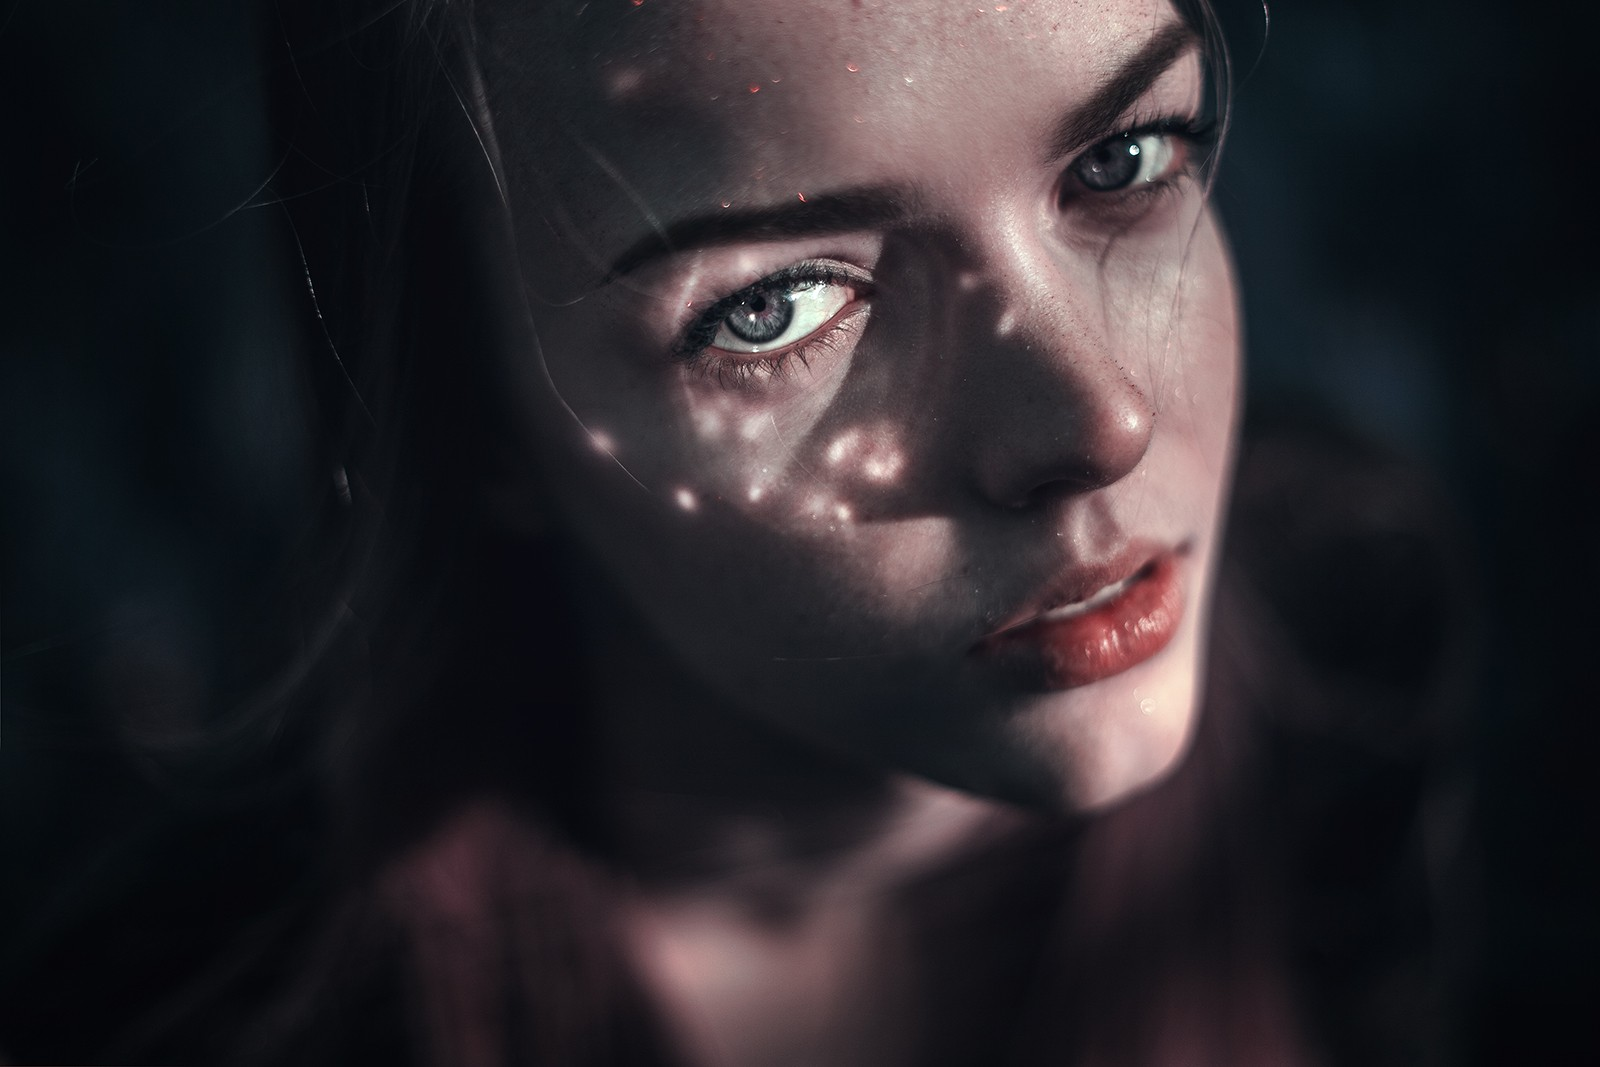 russenschlampe fick marika johansson porno videos